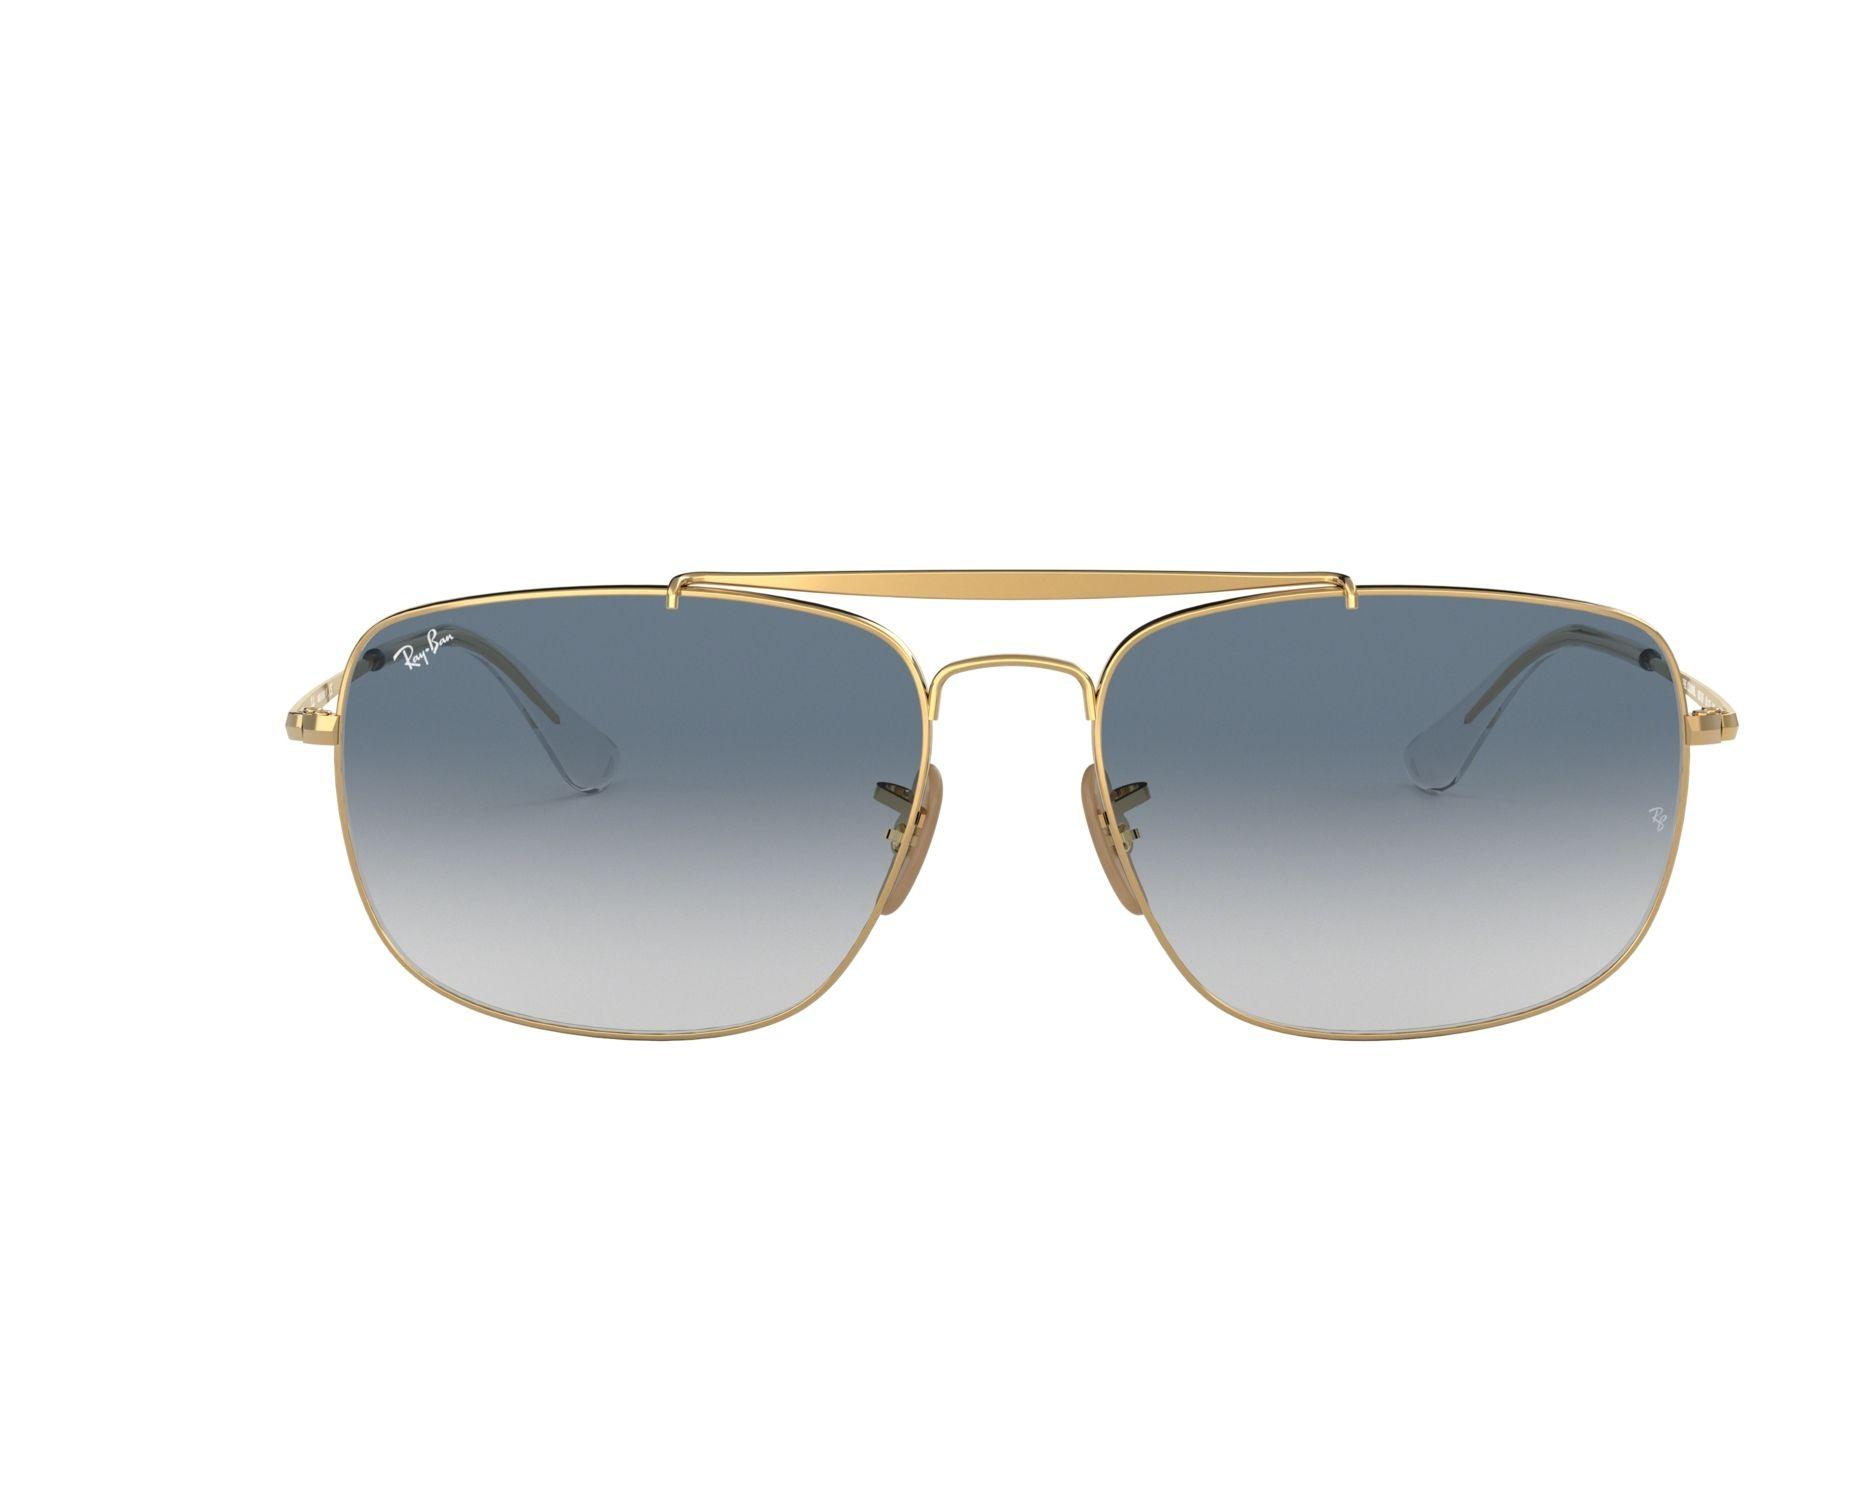 fa0f94b61d7 Sunglasses Ray-Ban RB-3560 001 3F 58-17 Gold 360 degree